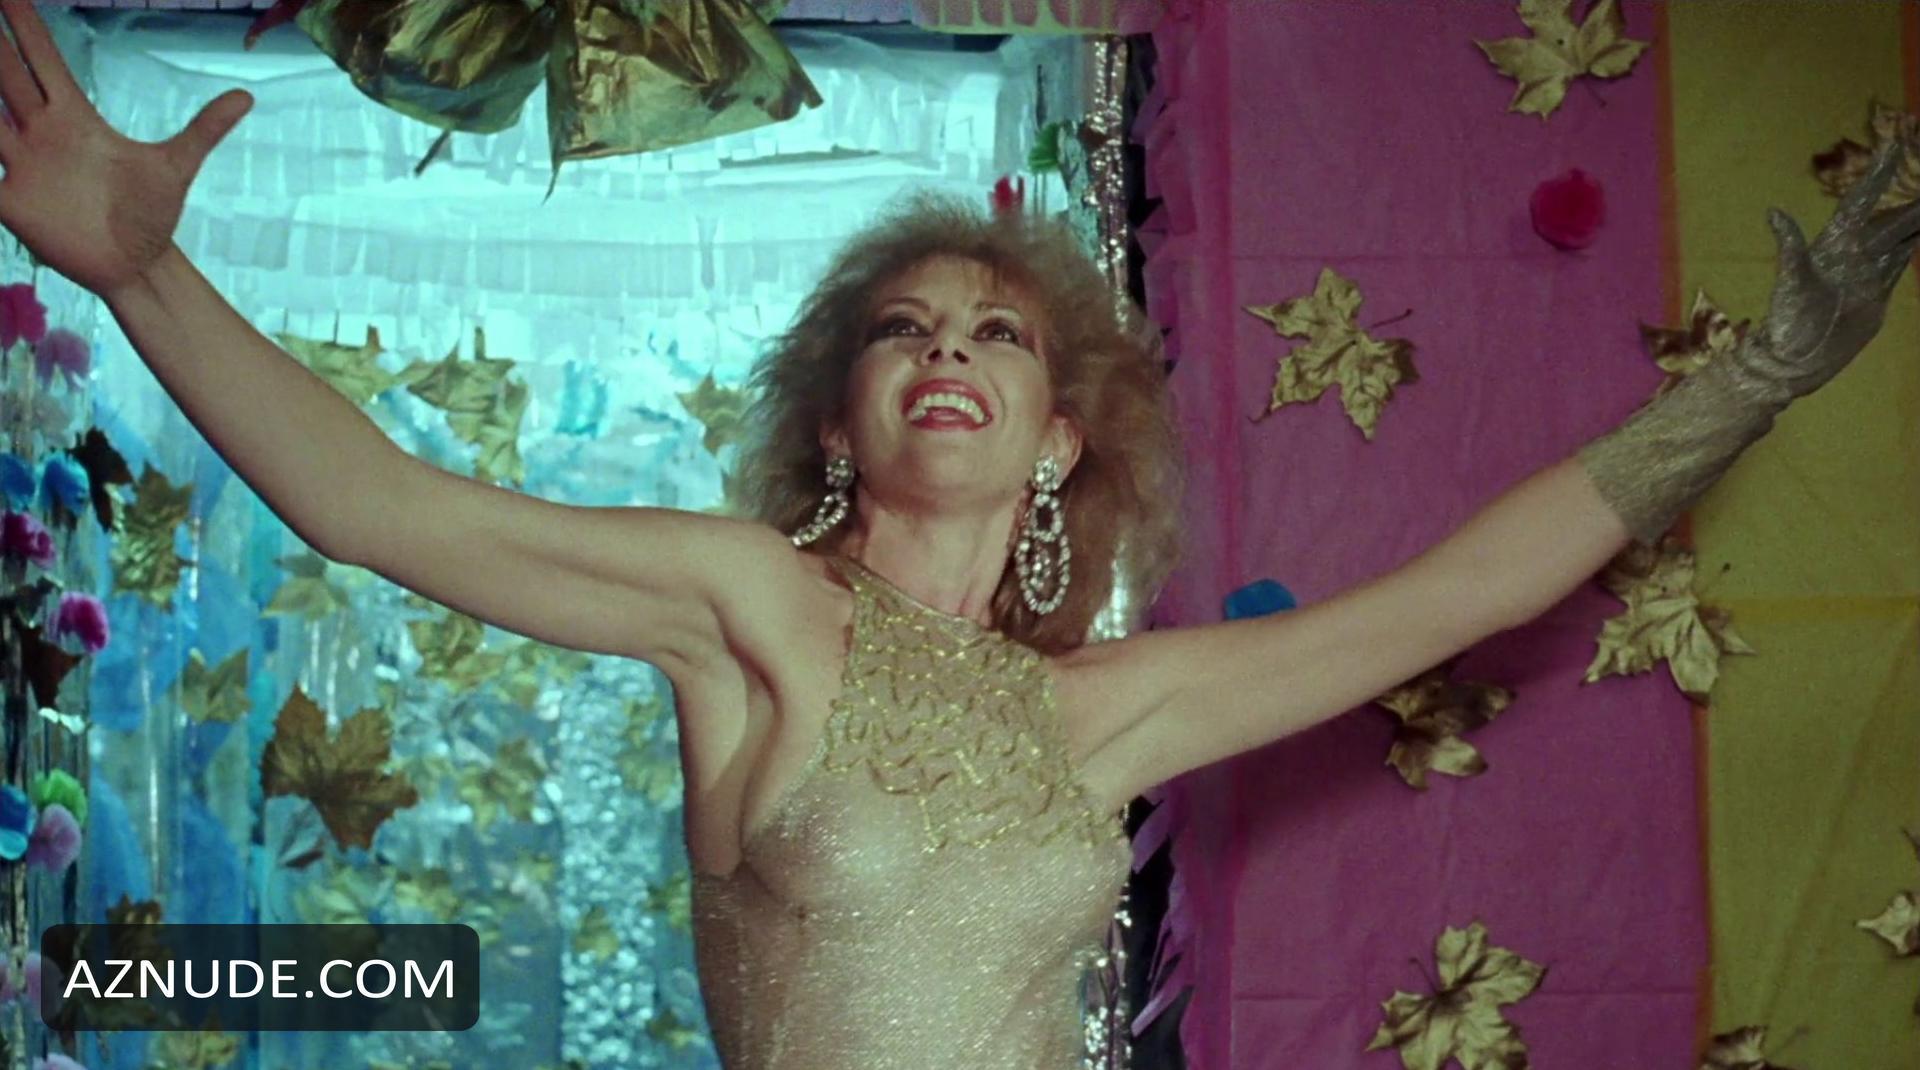 Cuentos eroticos ana belen emma cohen 1979 - 1 2